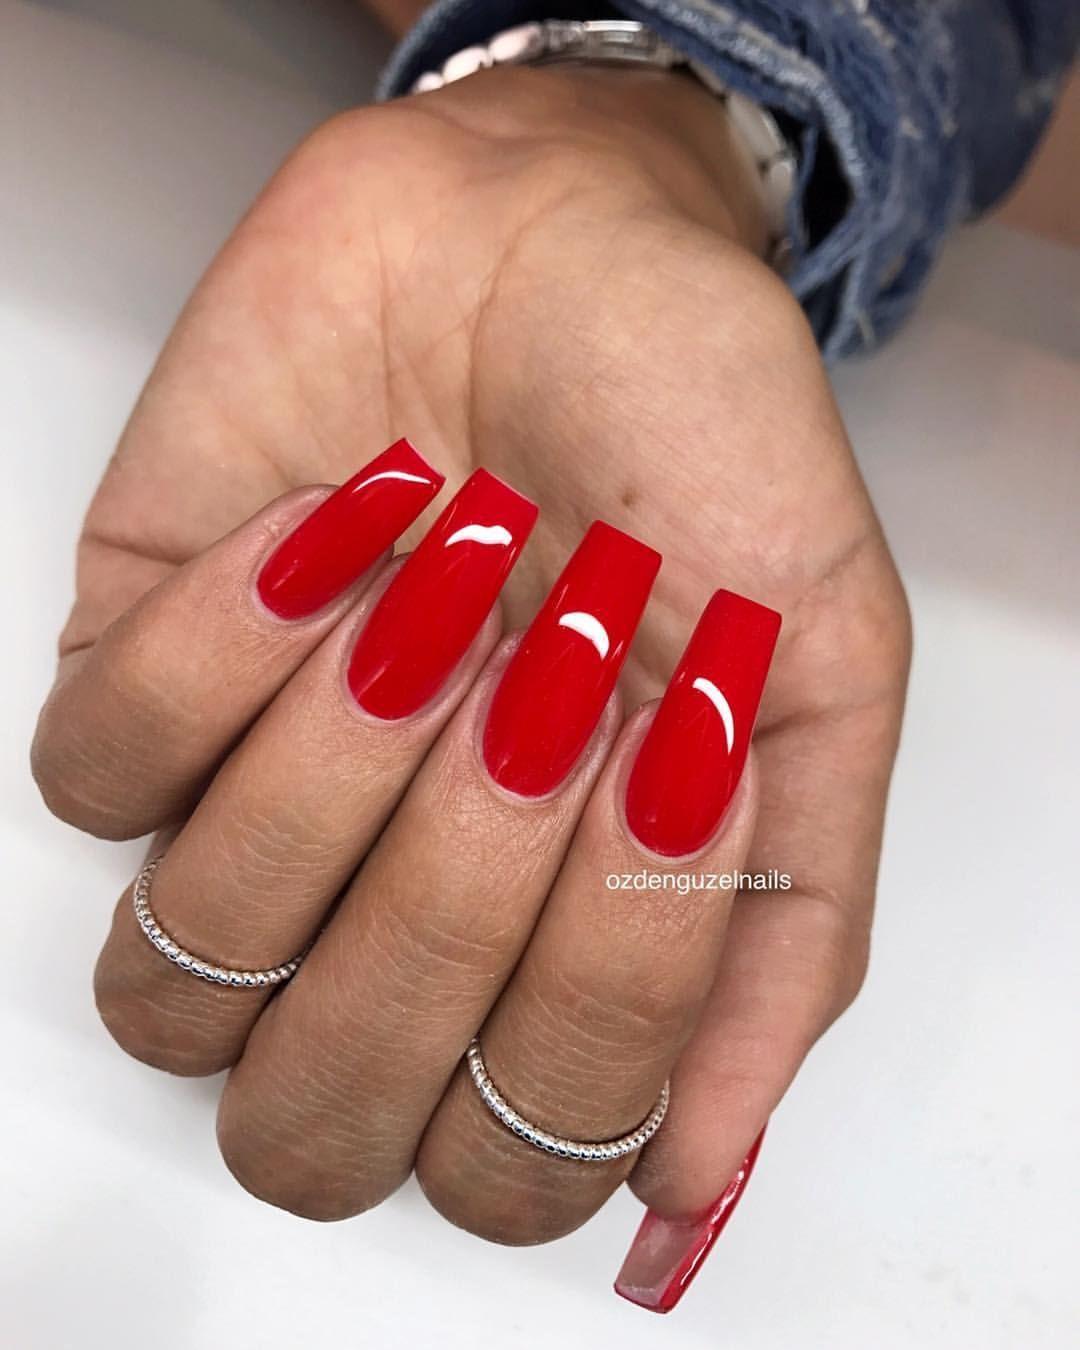 Red Acrylic Nails Red Acrylic Nails Long Square Acrylic Nails Pink Acrylic Nails